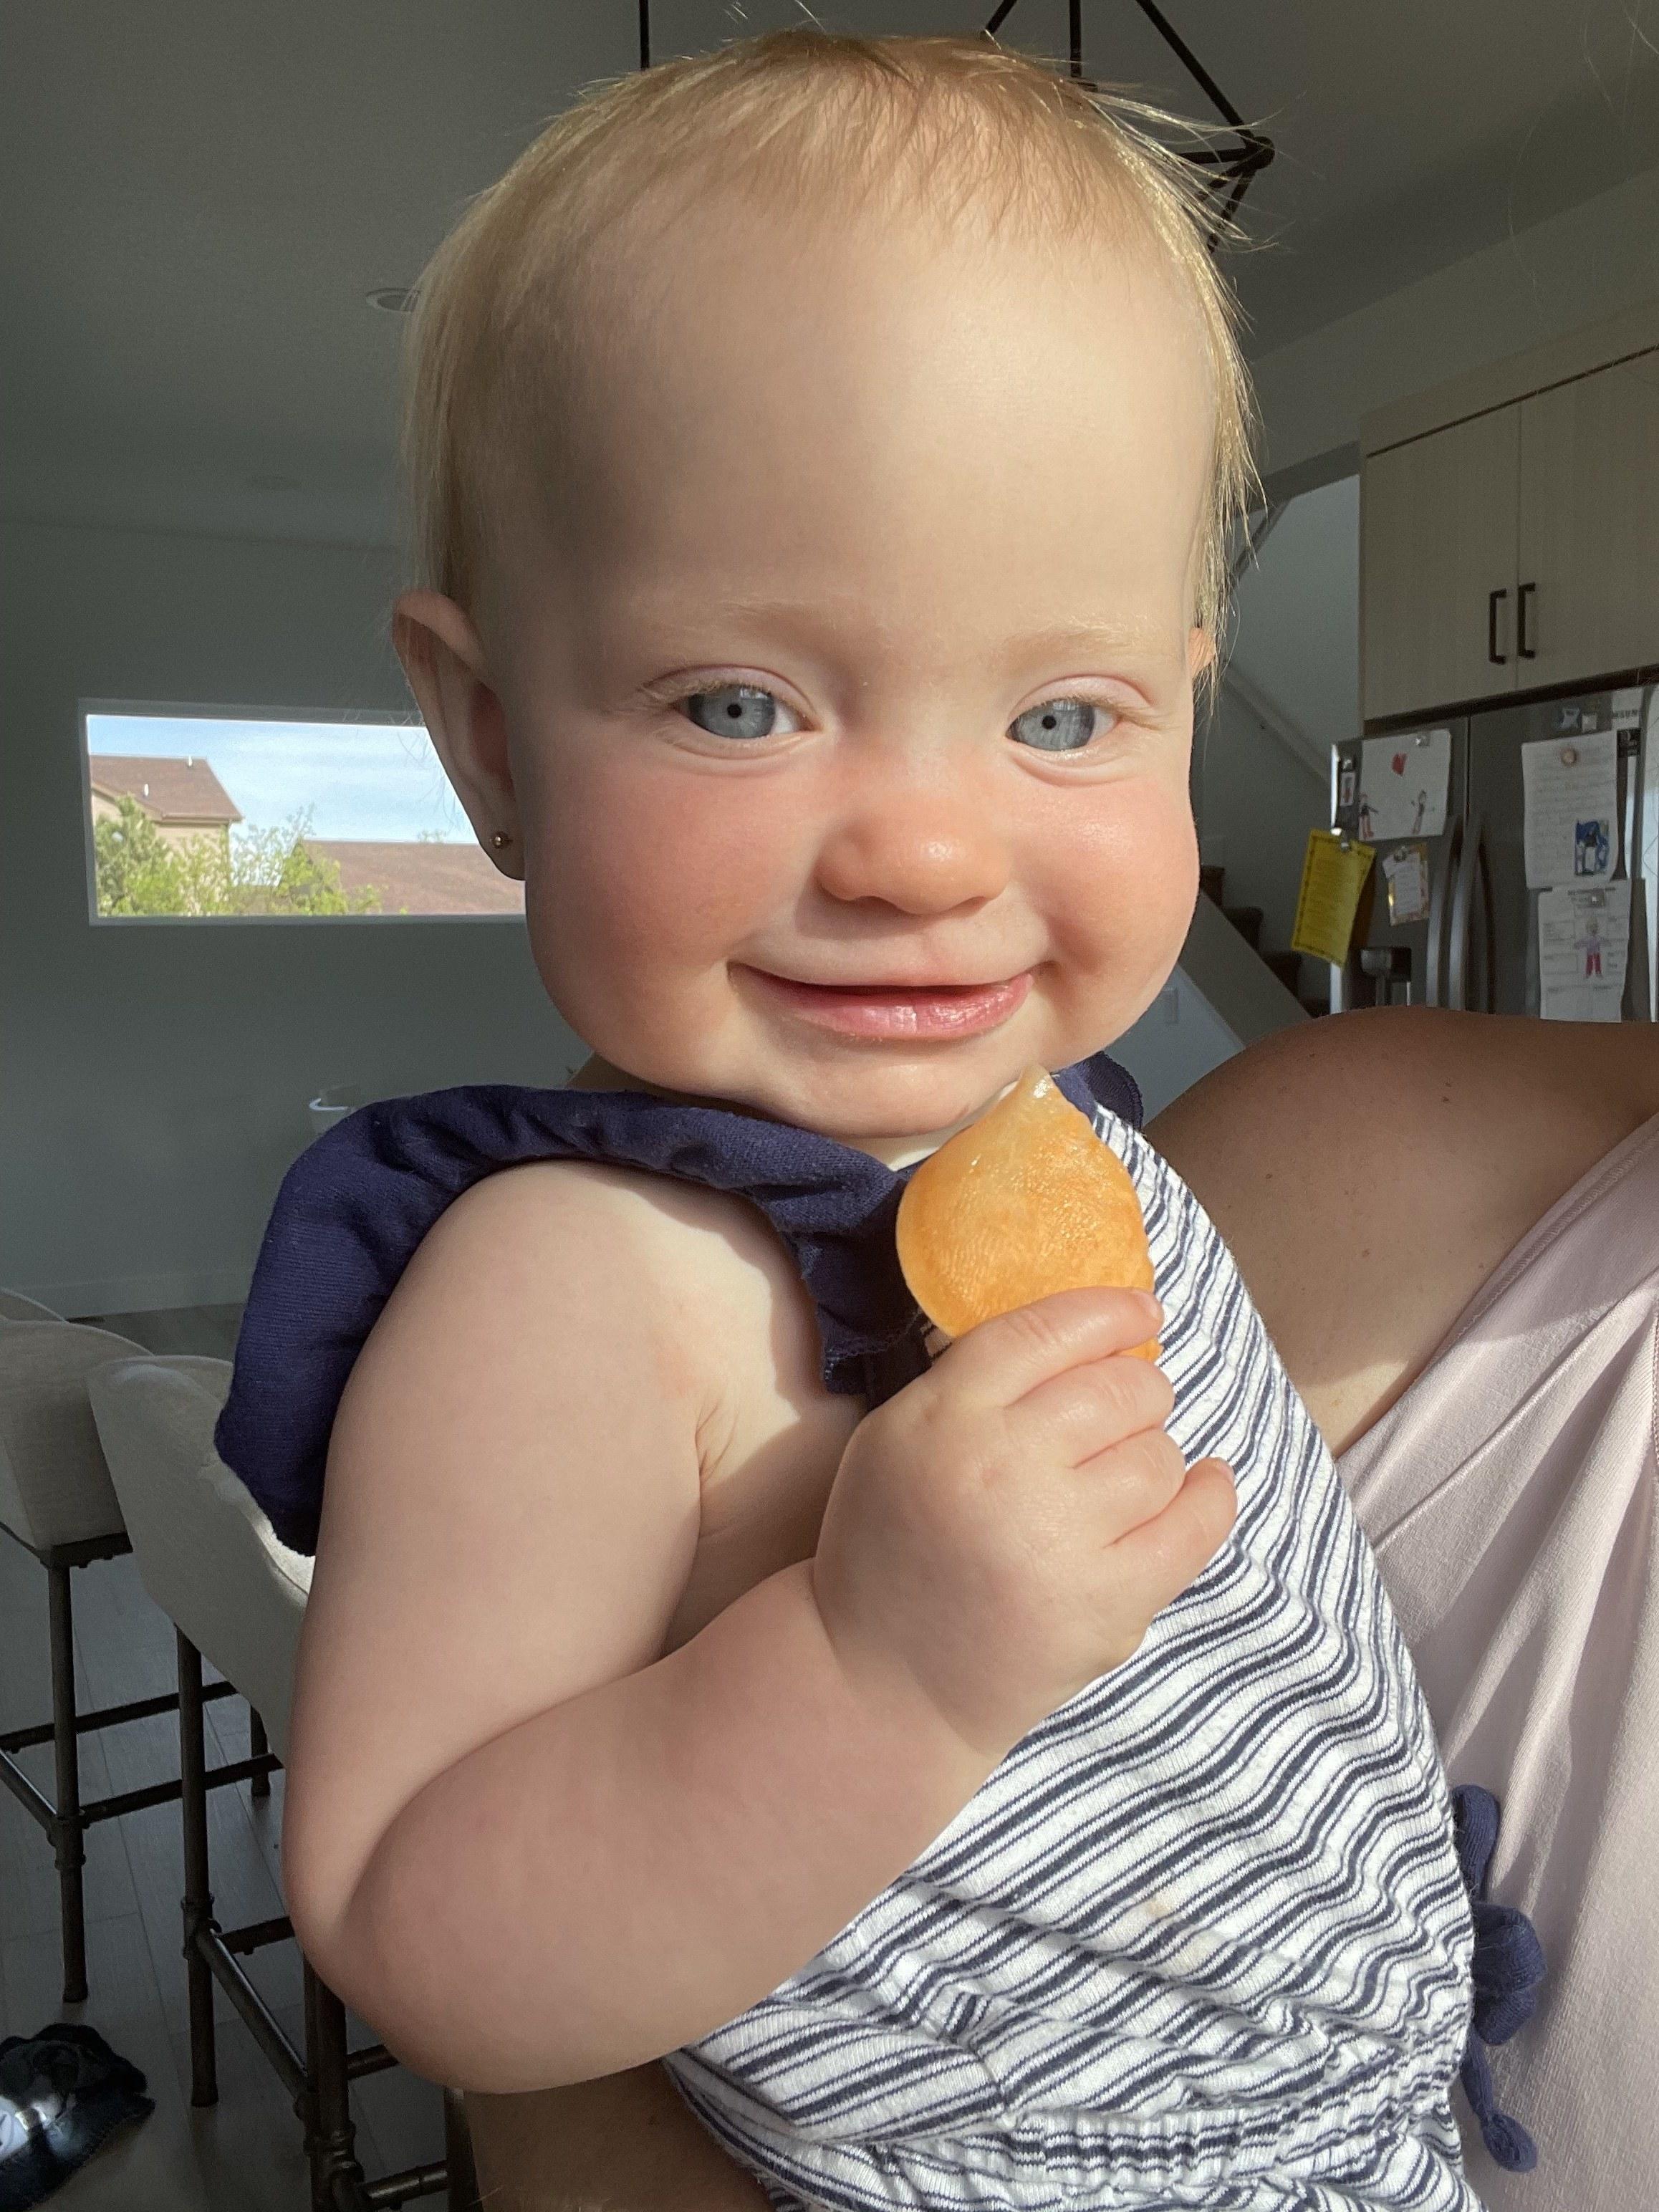 The author's youngest kid enjoying sweet potato fries